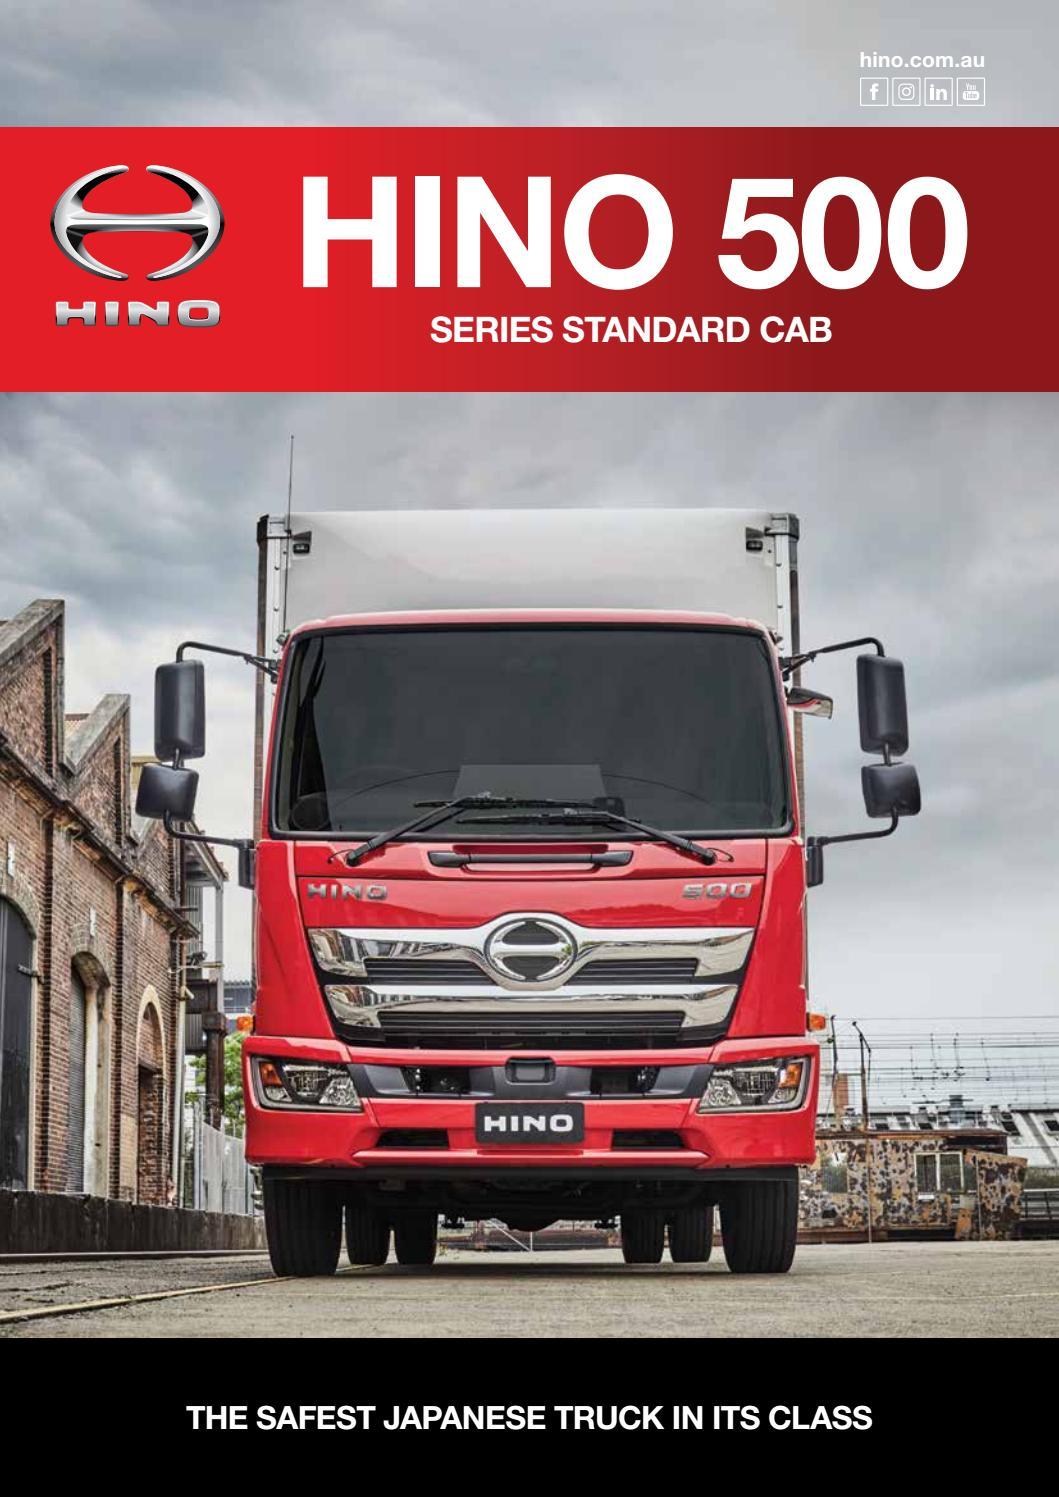 Hino 500 Series Standard Cab by Hino Australia - issuu